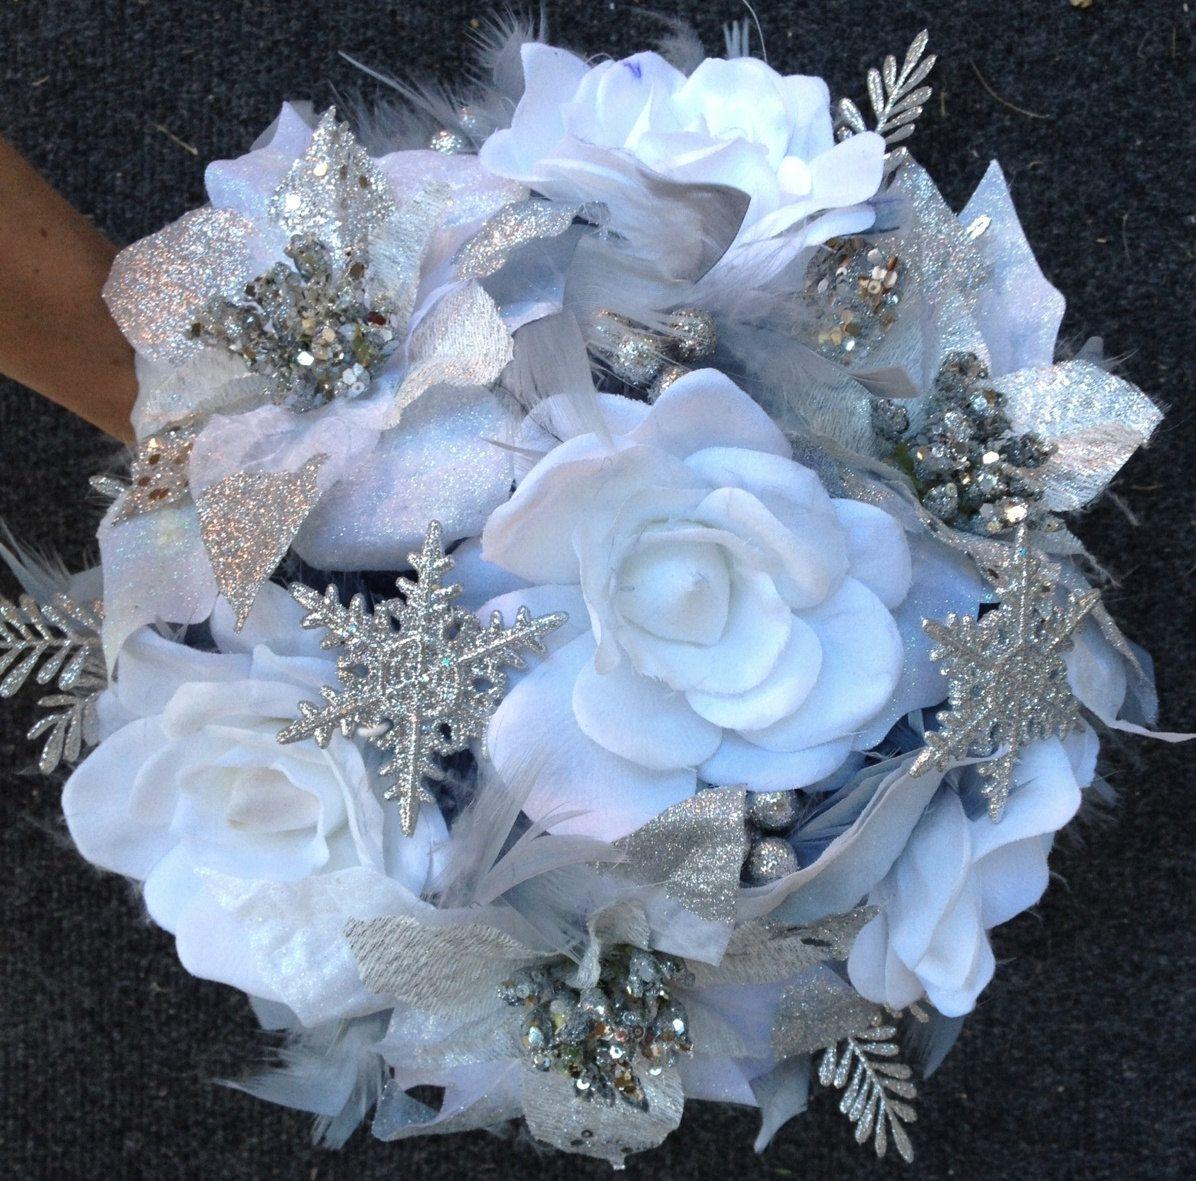 DRAMATIC Winter Wonderland Feathers & Flowers Bridal